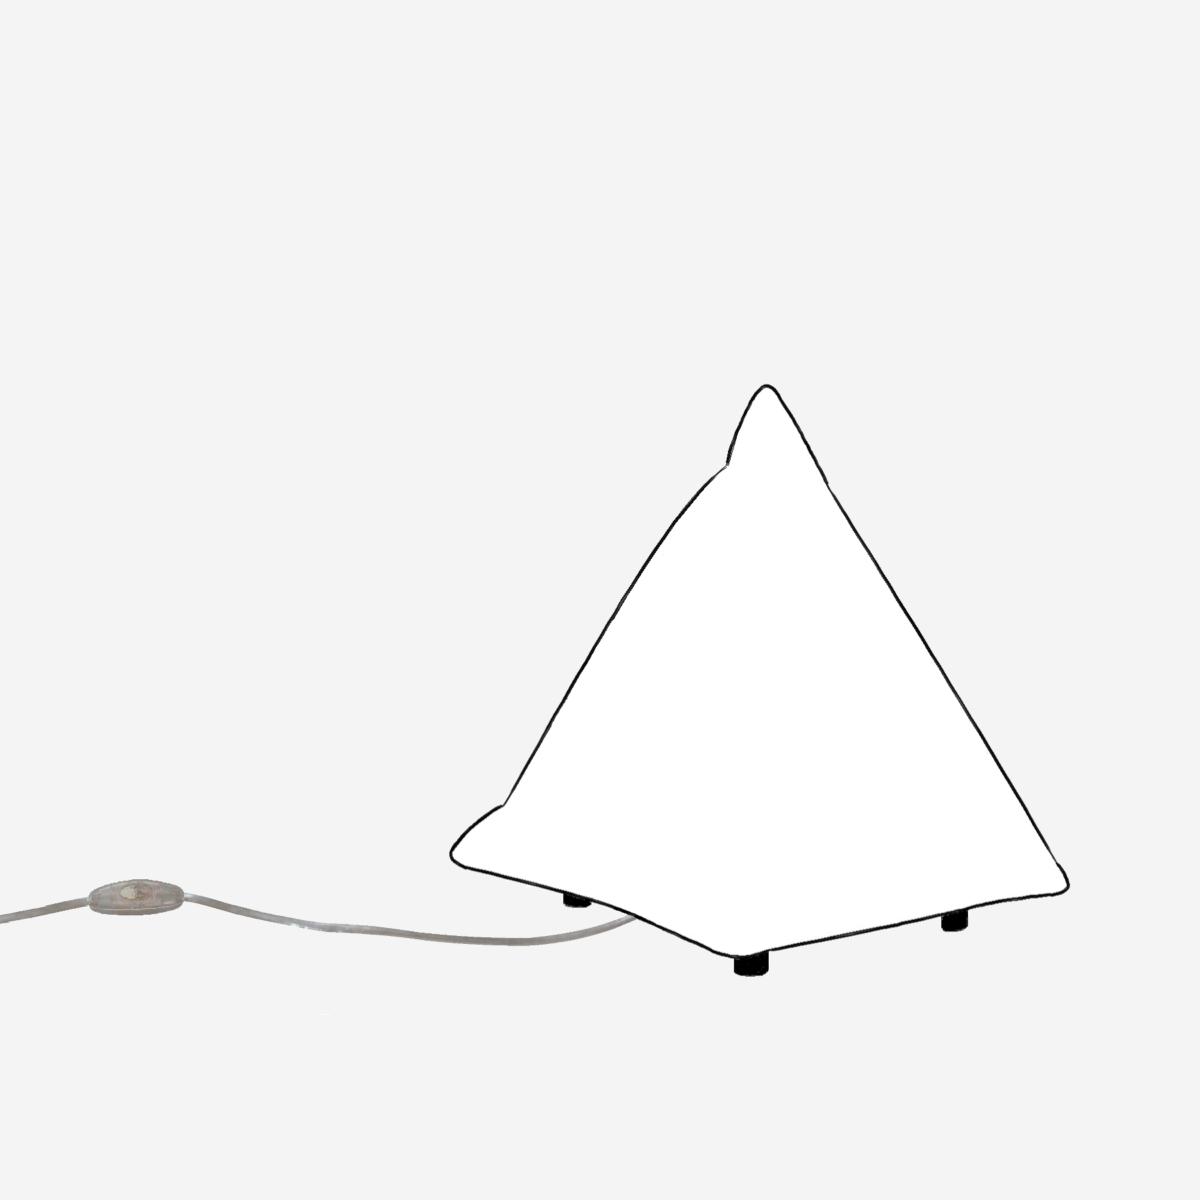 b2-gulvlampe-produktinformationer-faq_png